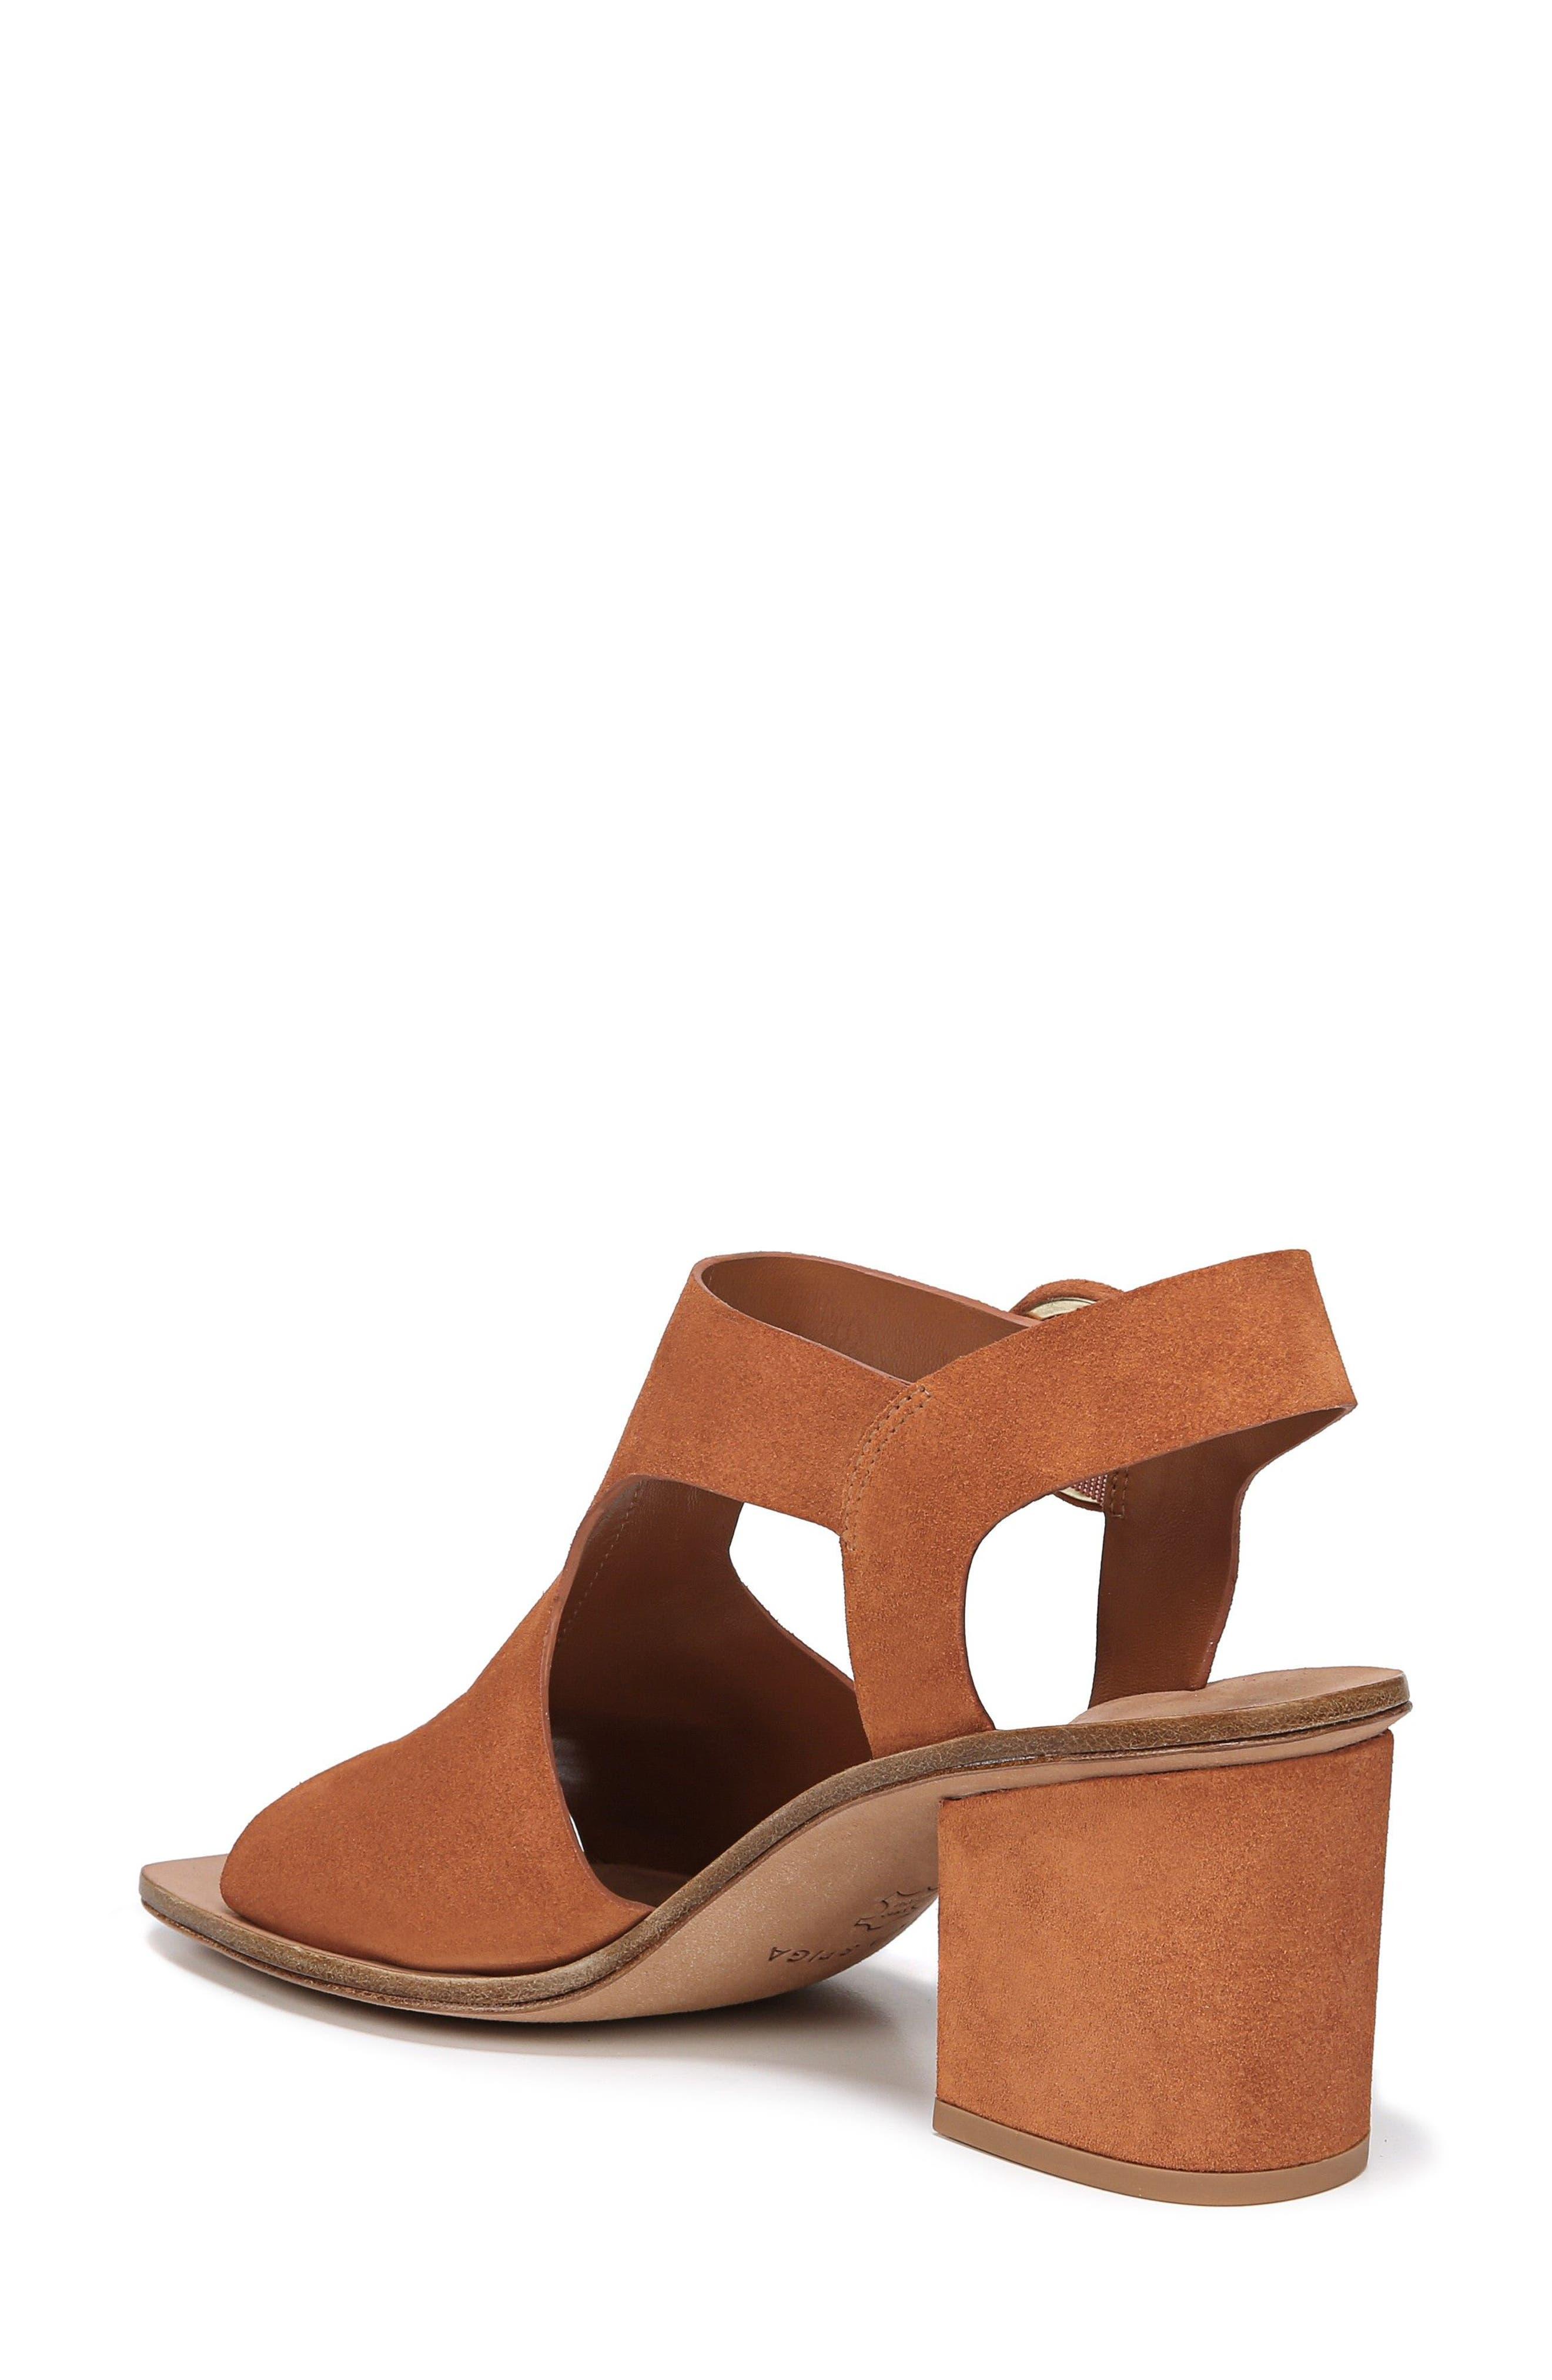 Katya Shield Sandal,                             Alternate thumbnail 2, color,                             Amber Suede